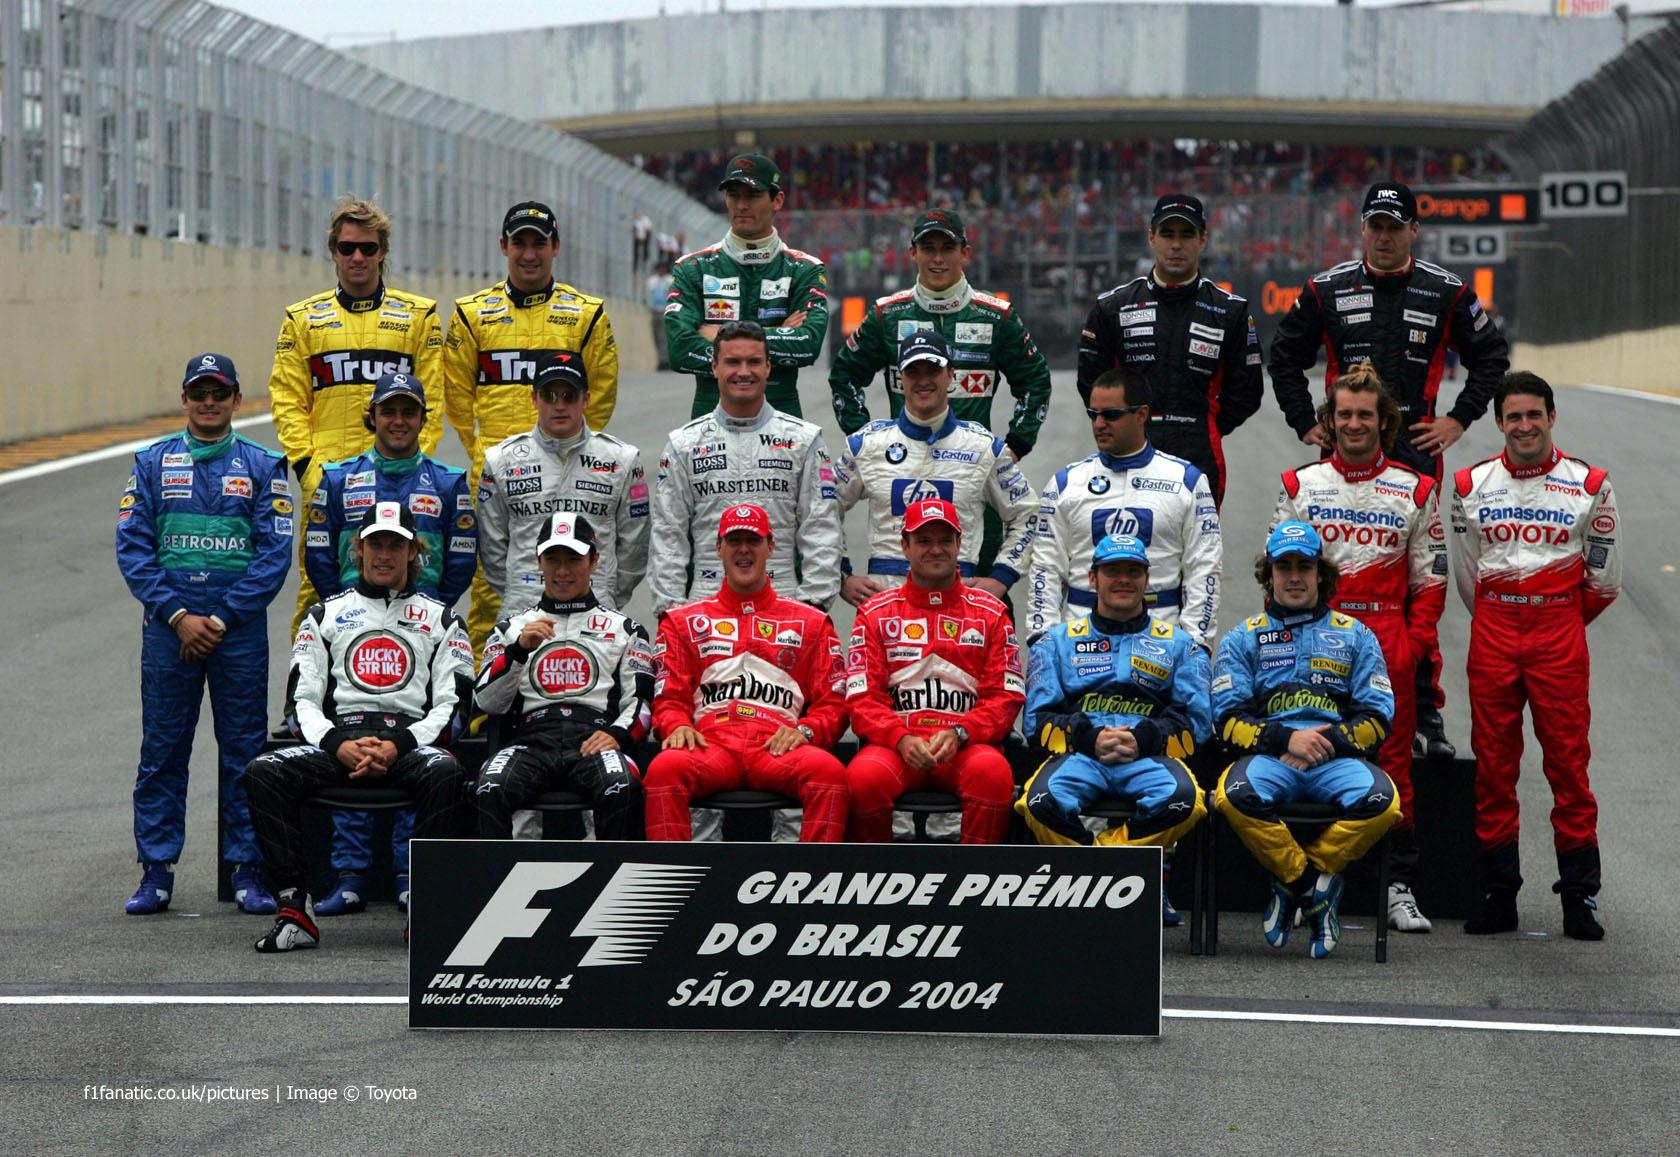 Drivers, Interlagos, 2004